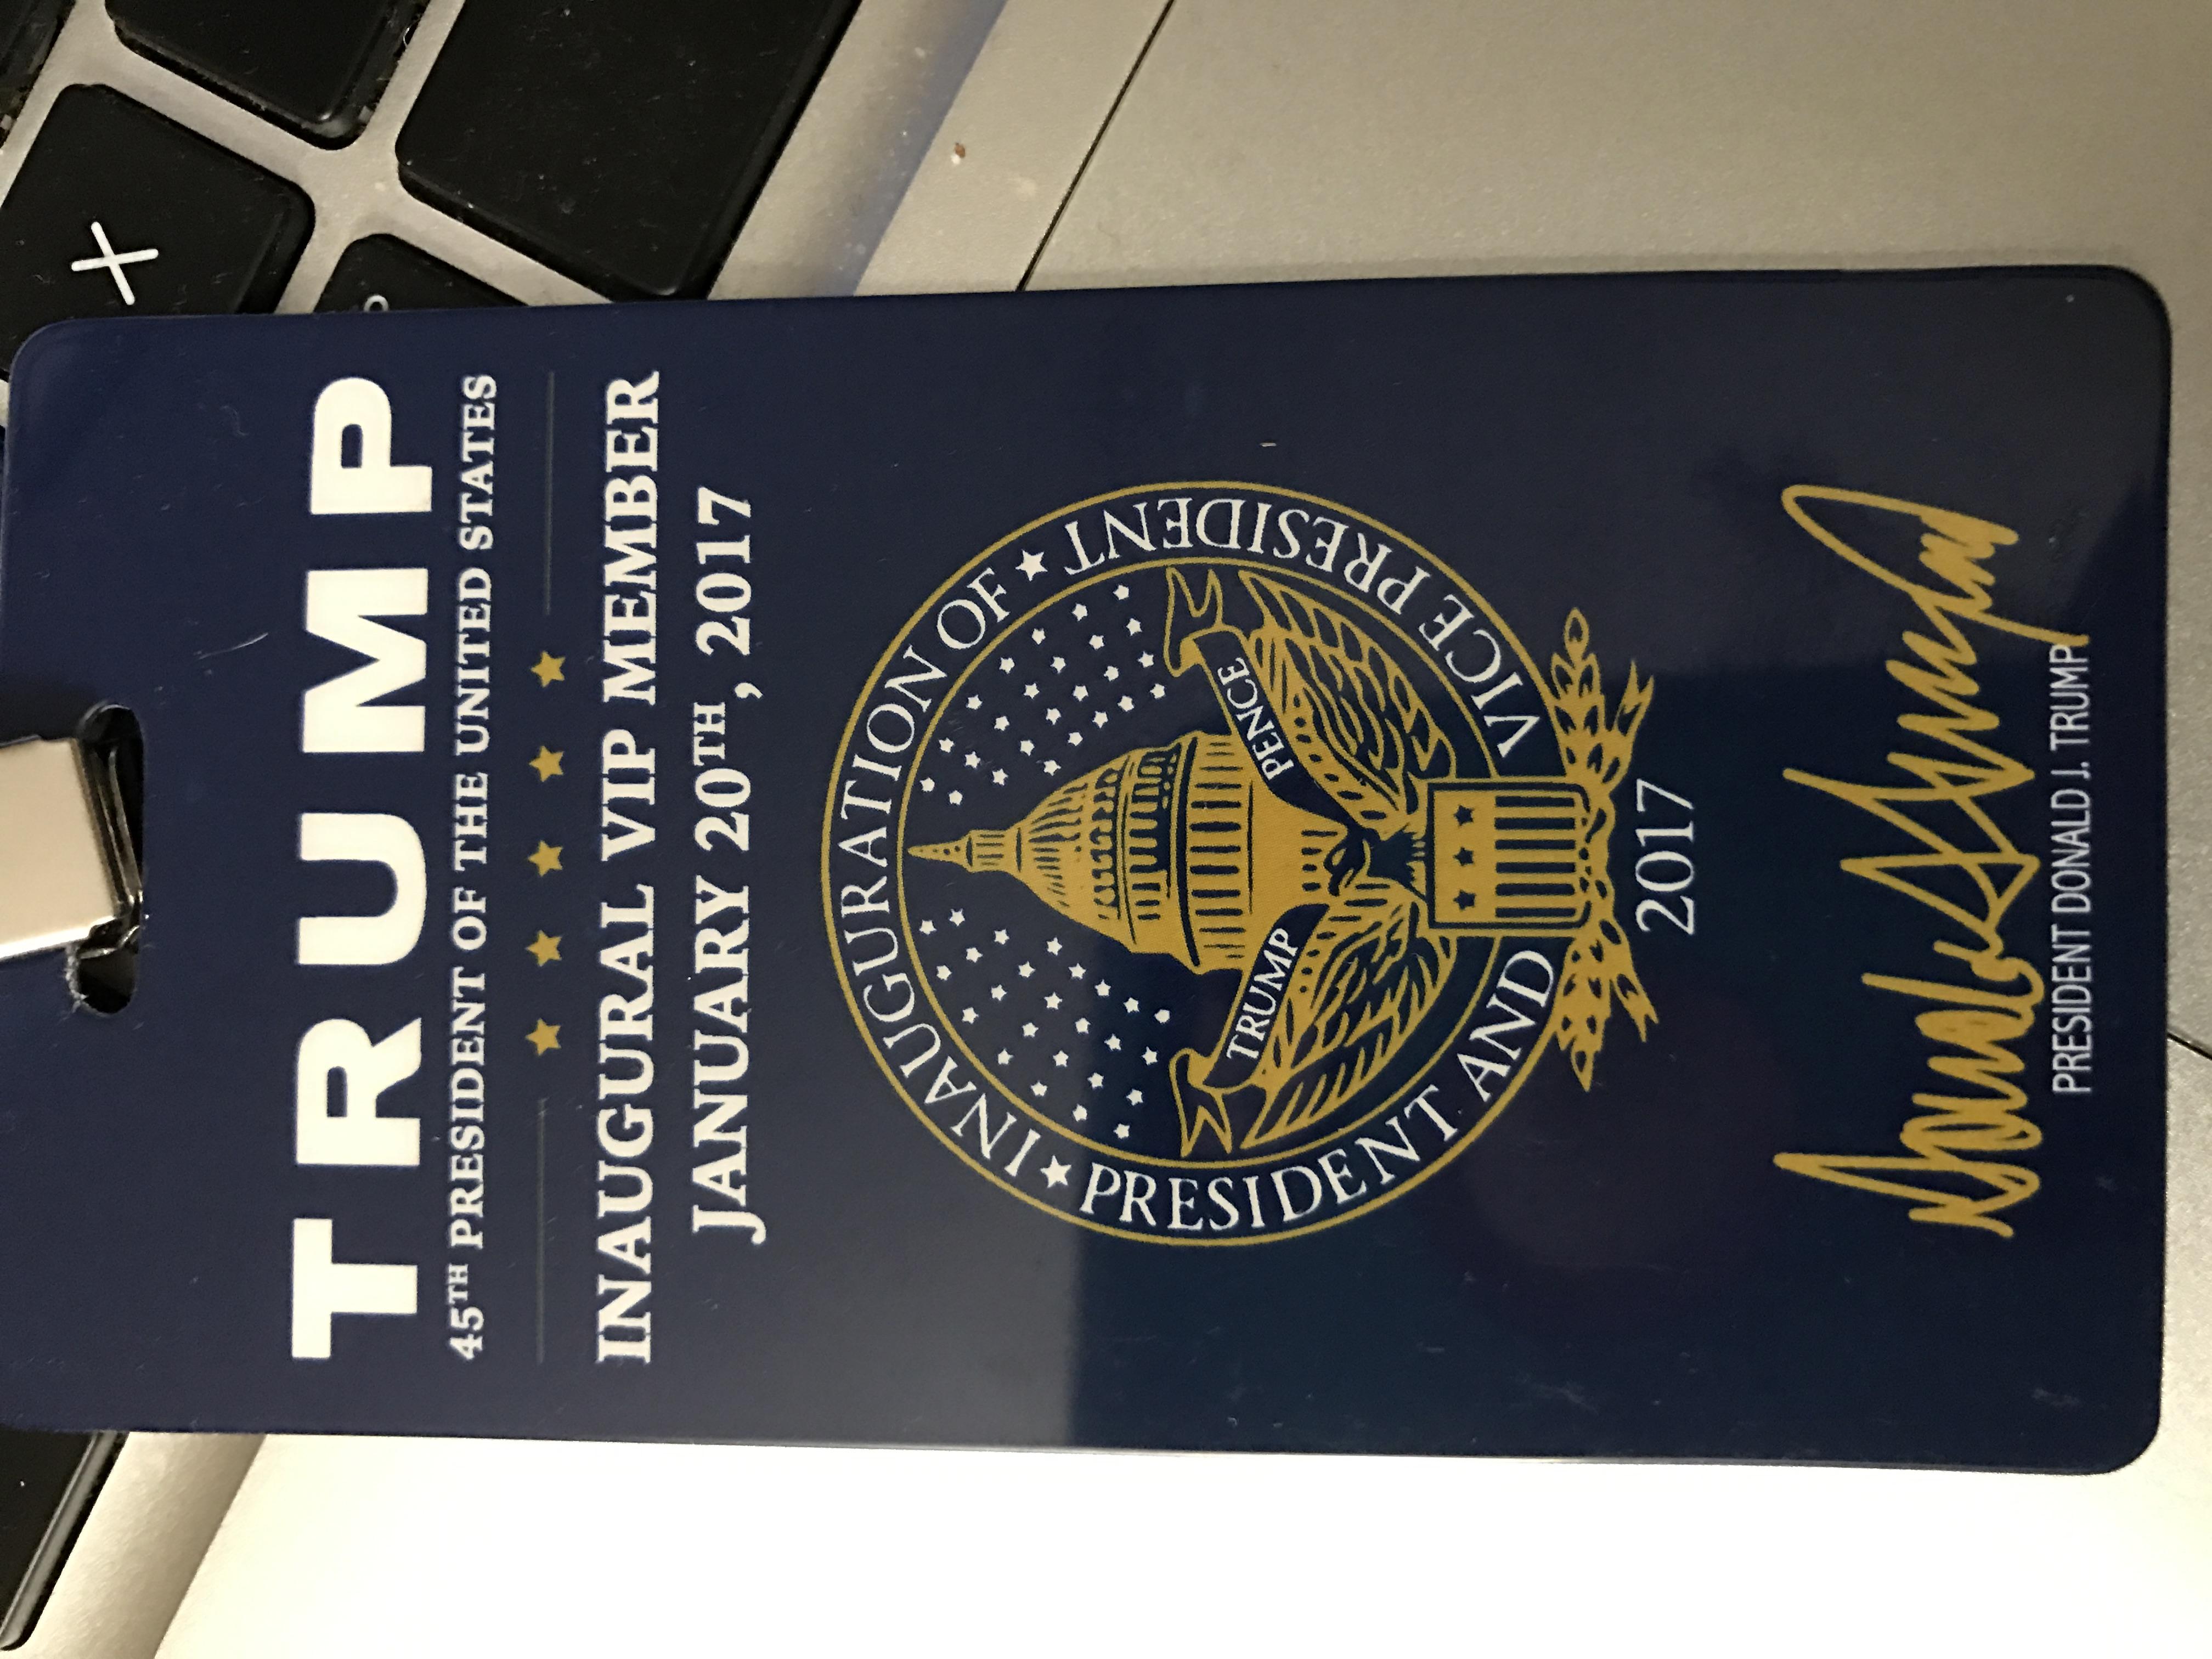 Lisa Christiansen - Donald Trump - InaugurationIMG_1252